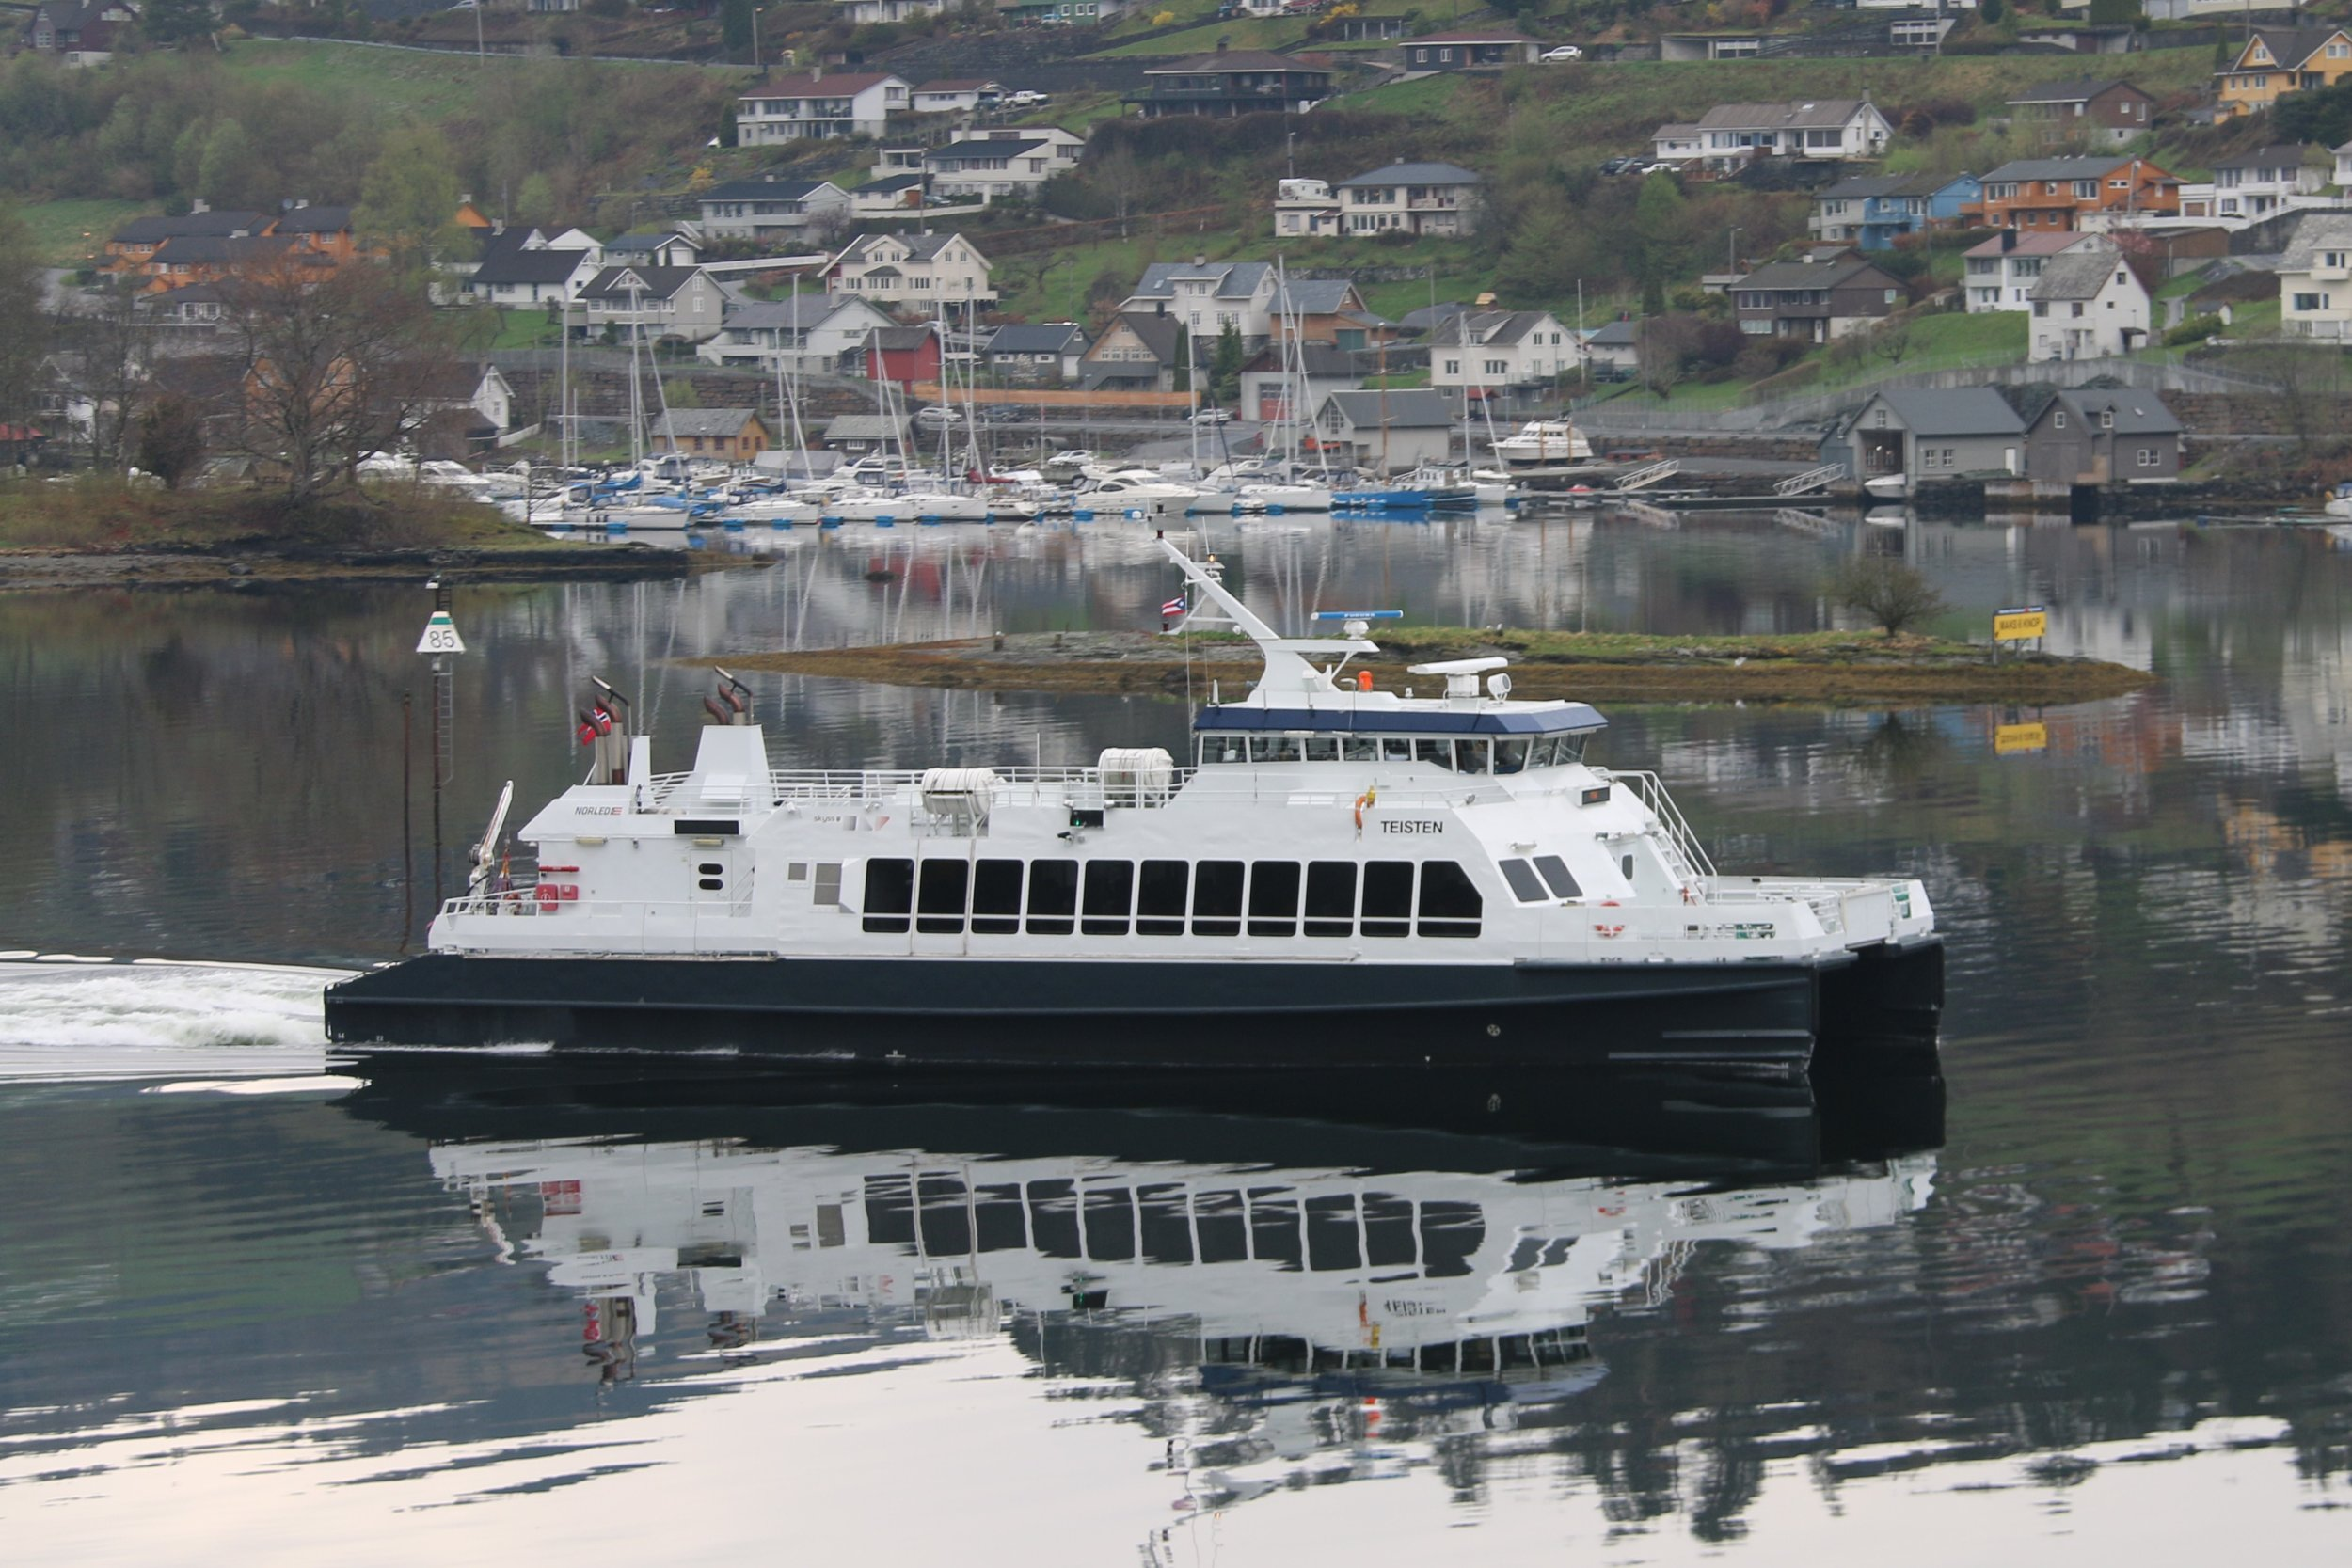 Båt_Turistruta.JPG